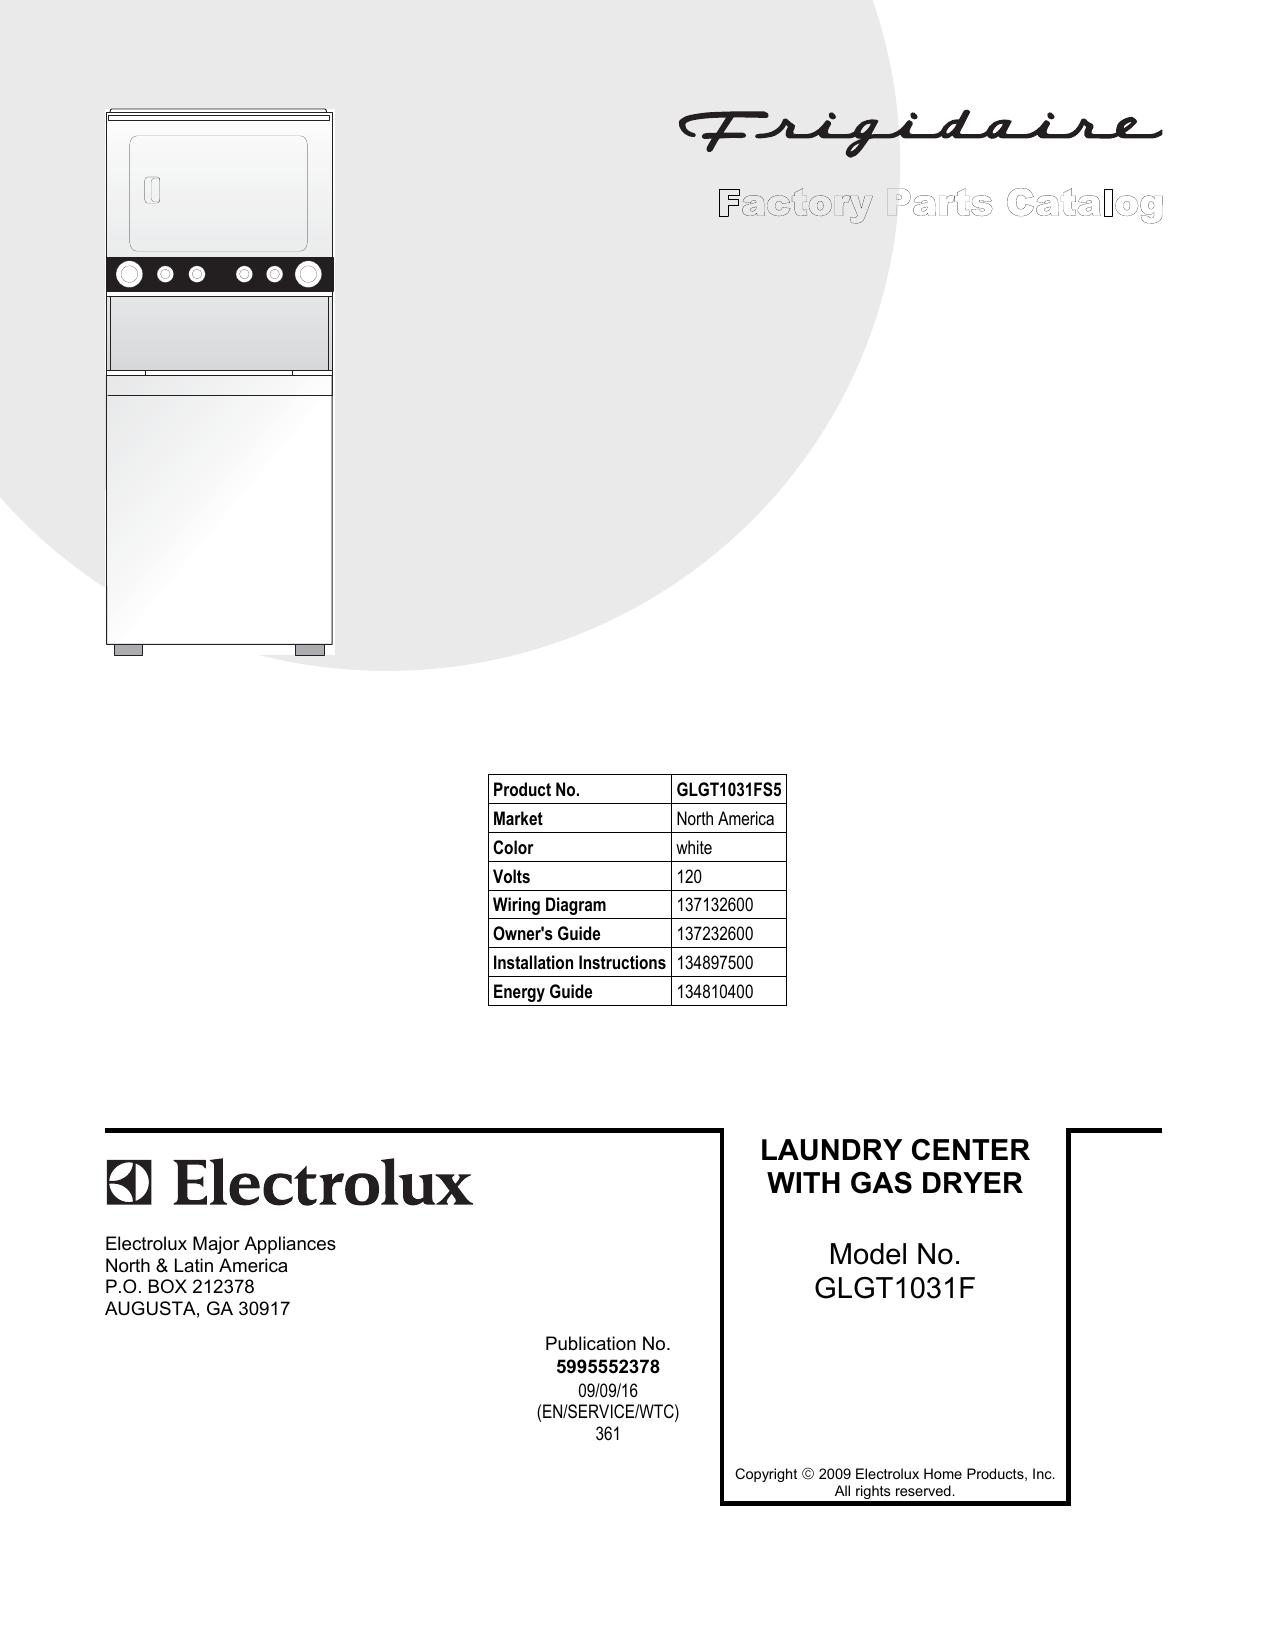 Frigidaire Washer Dryer Glgt1031f User Manual Manualzz